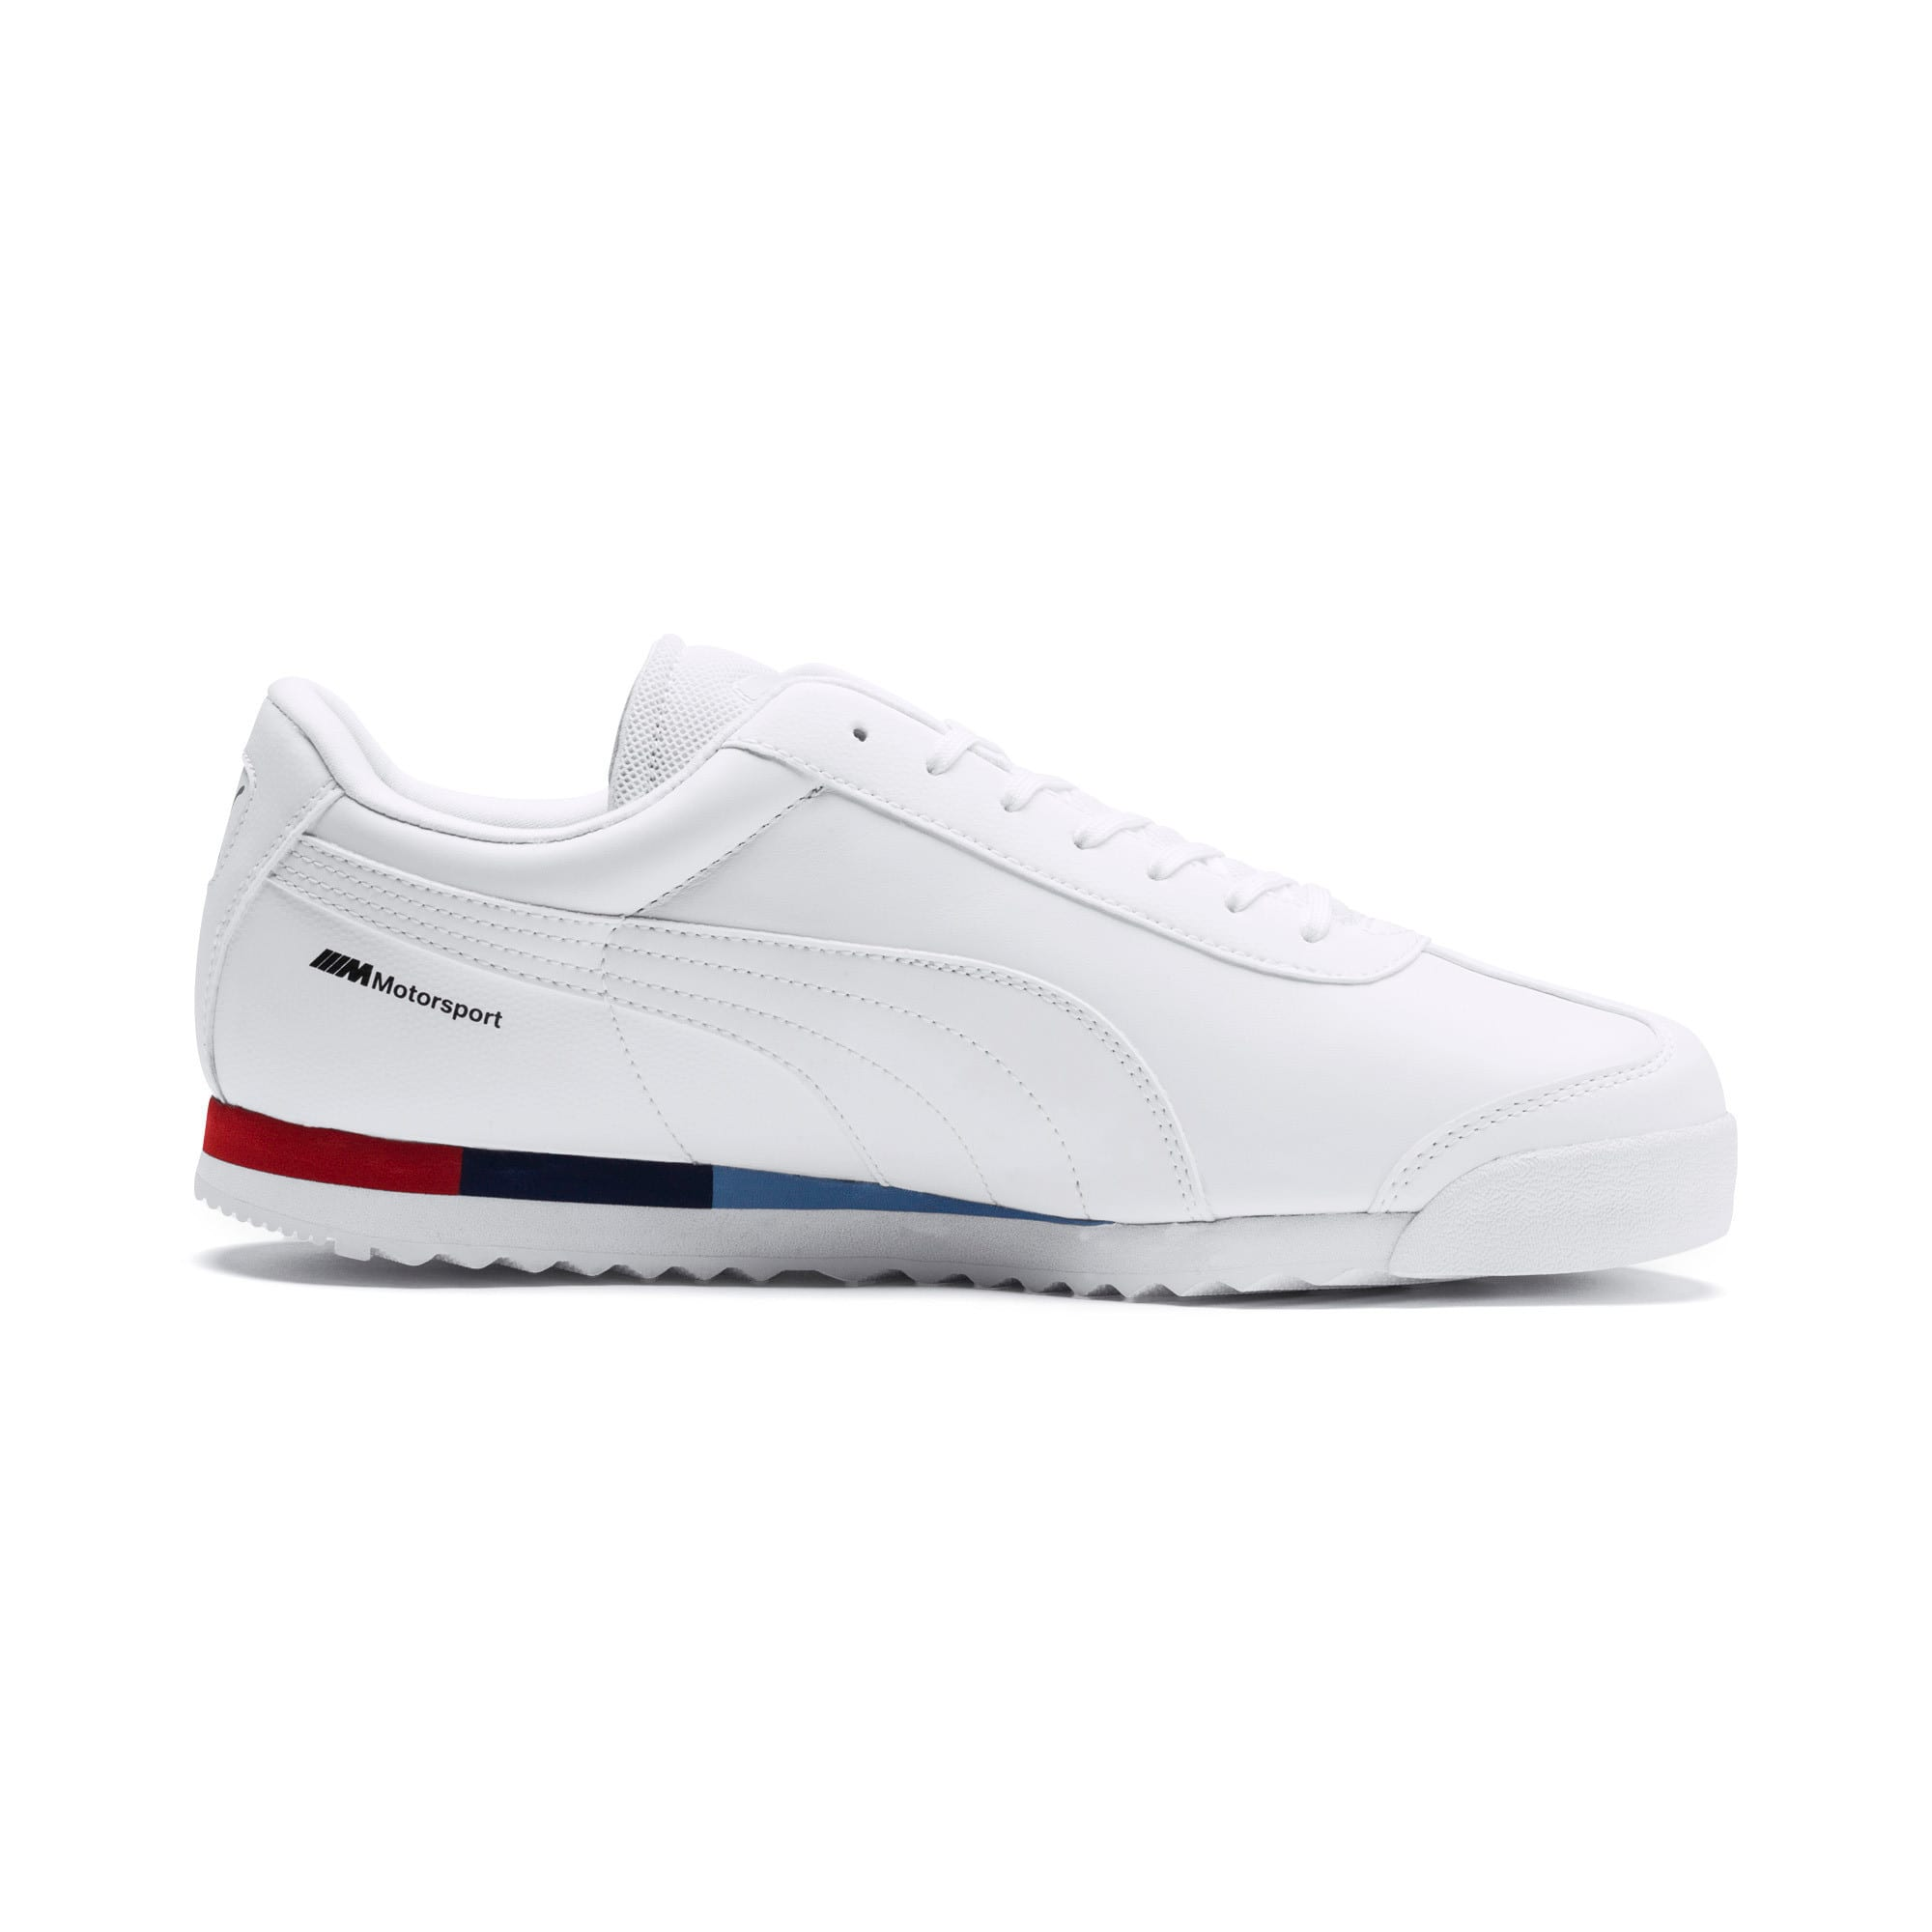 Thumbnail 5 of BMW M Motorsport Roma Herren Sneaker, Puma White-Puma White, medium